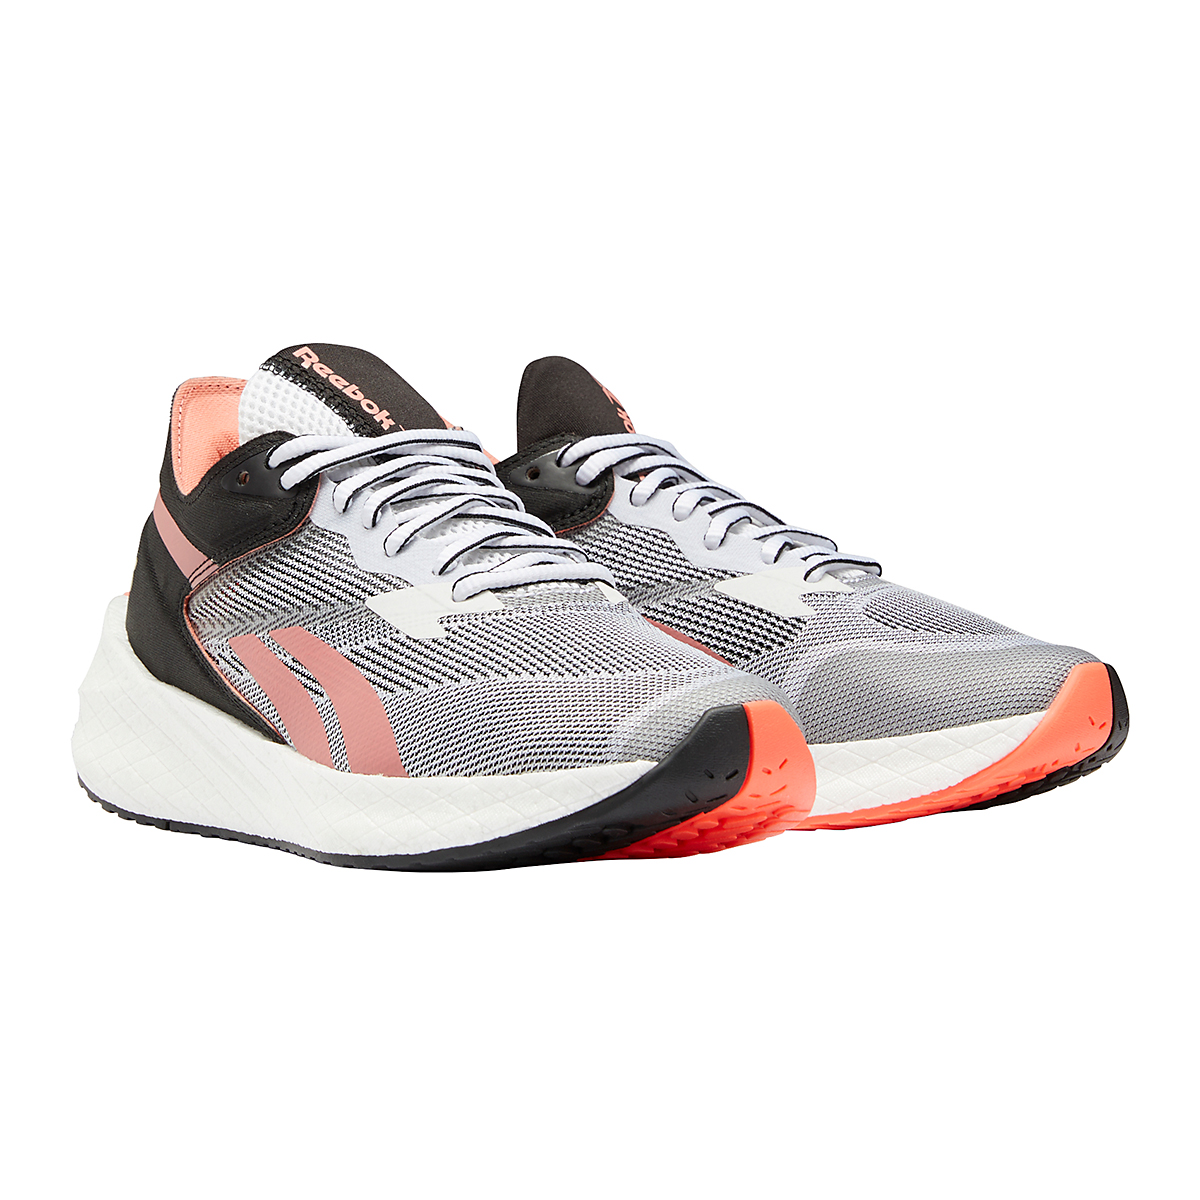 Women's Reebok Floatride Energy Symmetros Running Shoe - Color: White/Core Black/Twisted Coral - Size: 6.5 - Width: Regular, White/Core Black/Twisted Coral, large, image 4